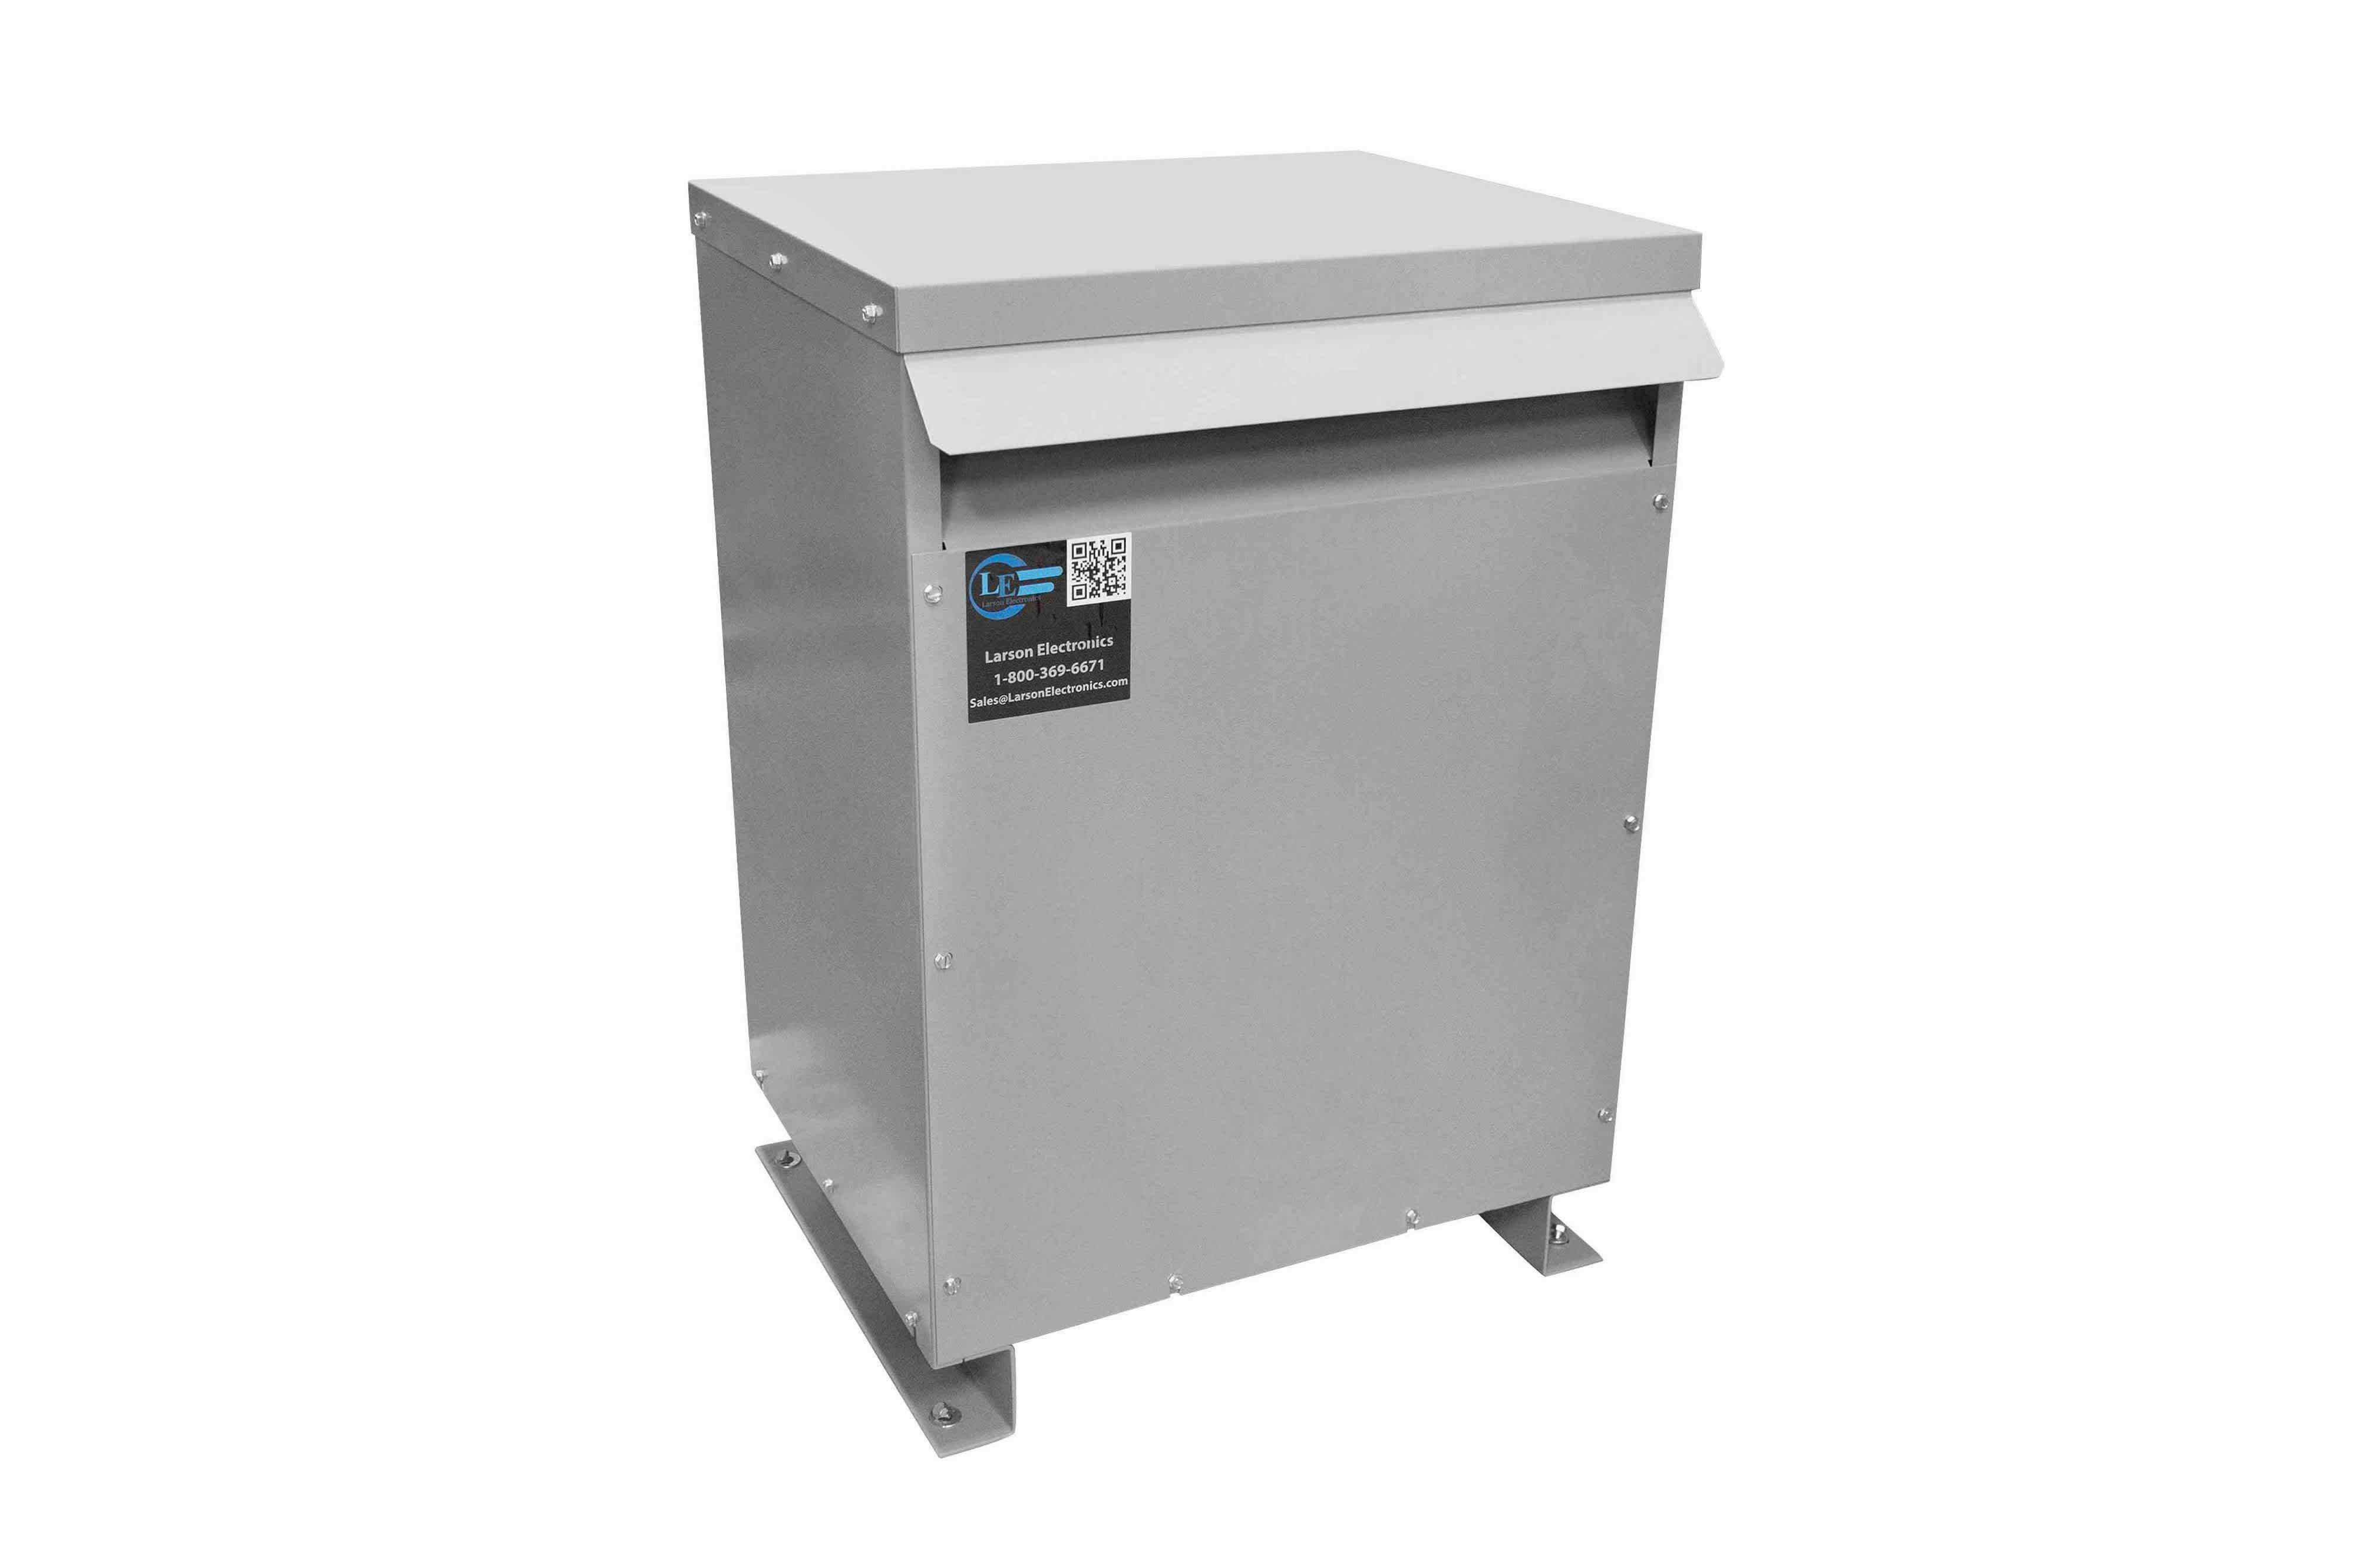 90 kVA 3PH Isolation Transformer, 480V Wye Primary, 415Y/240 Wye-N Secondary, N3R, Ventilated, 60 Hz